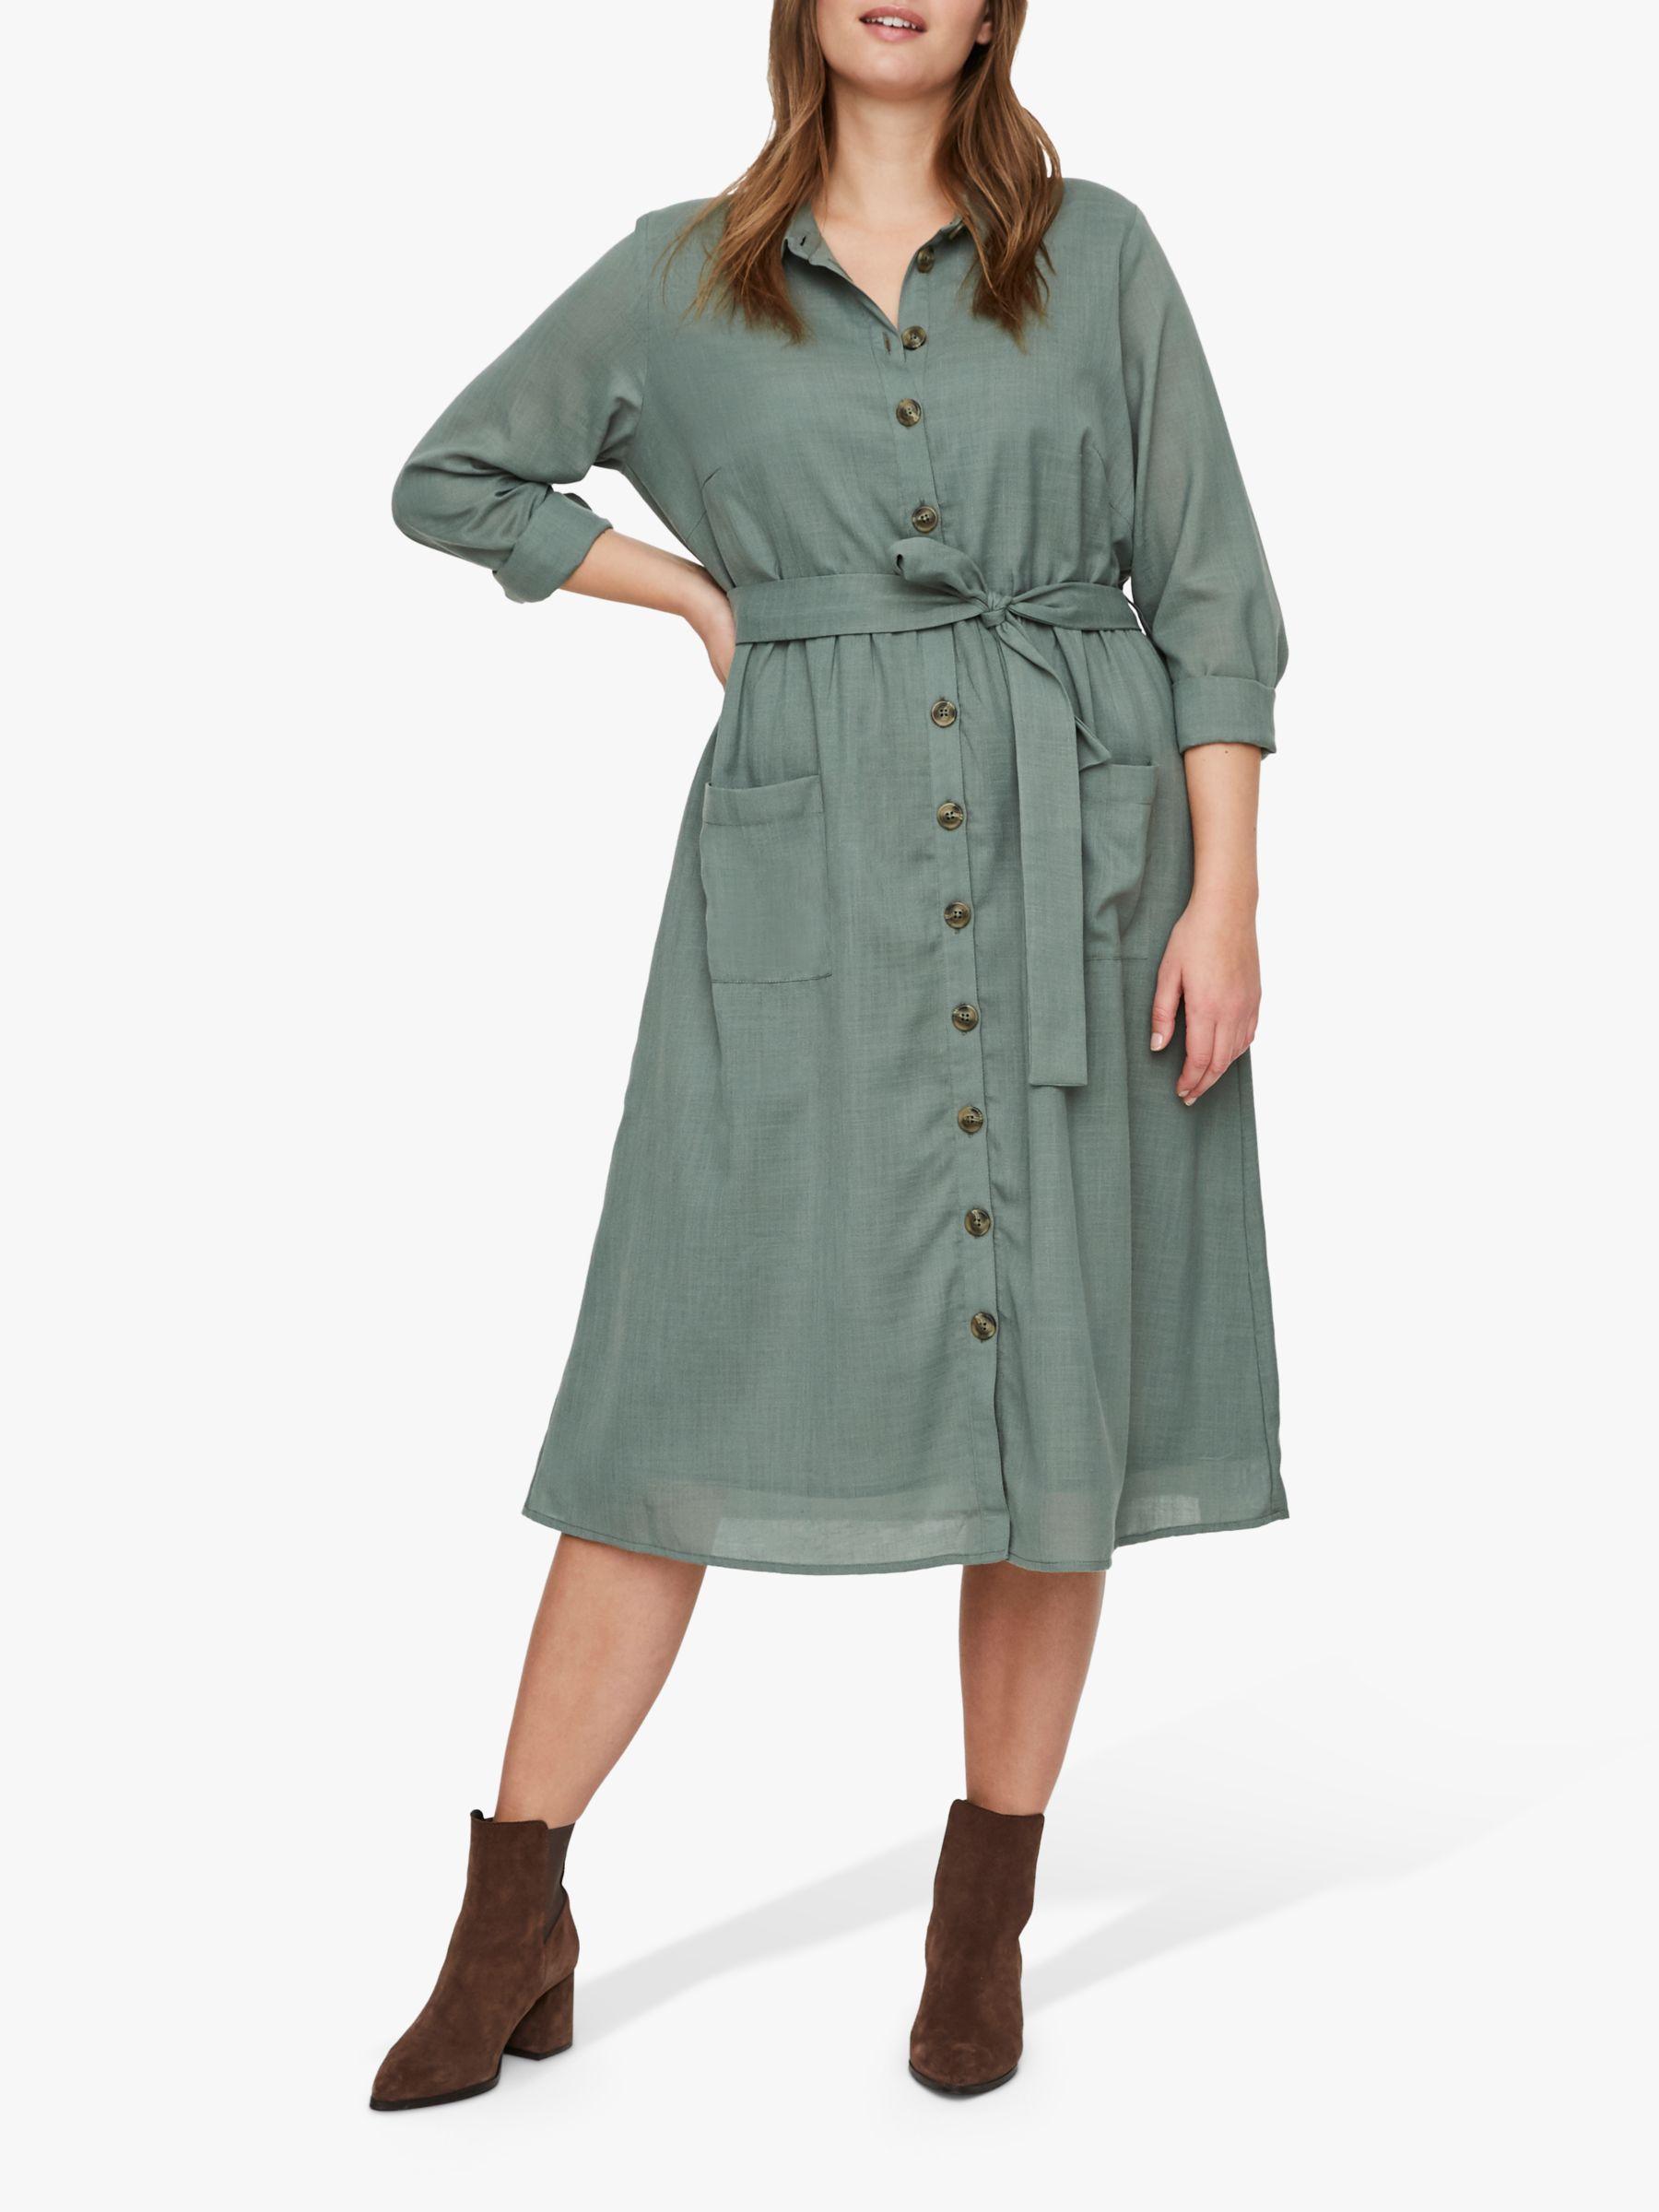 Junarose JUNAROSE Curve Lyza Shirt Dress, Laurel Wreath